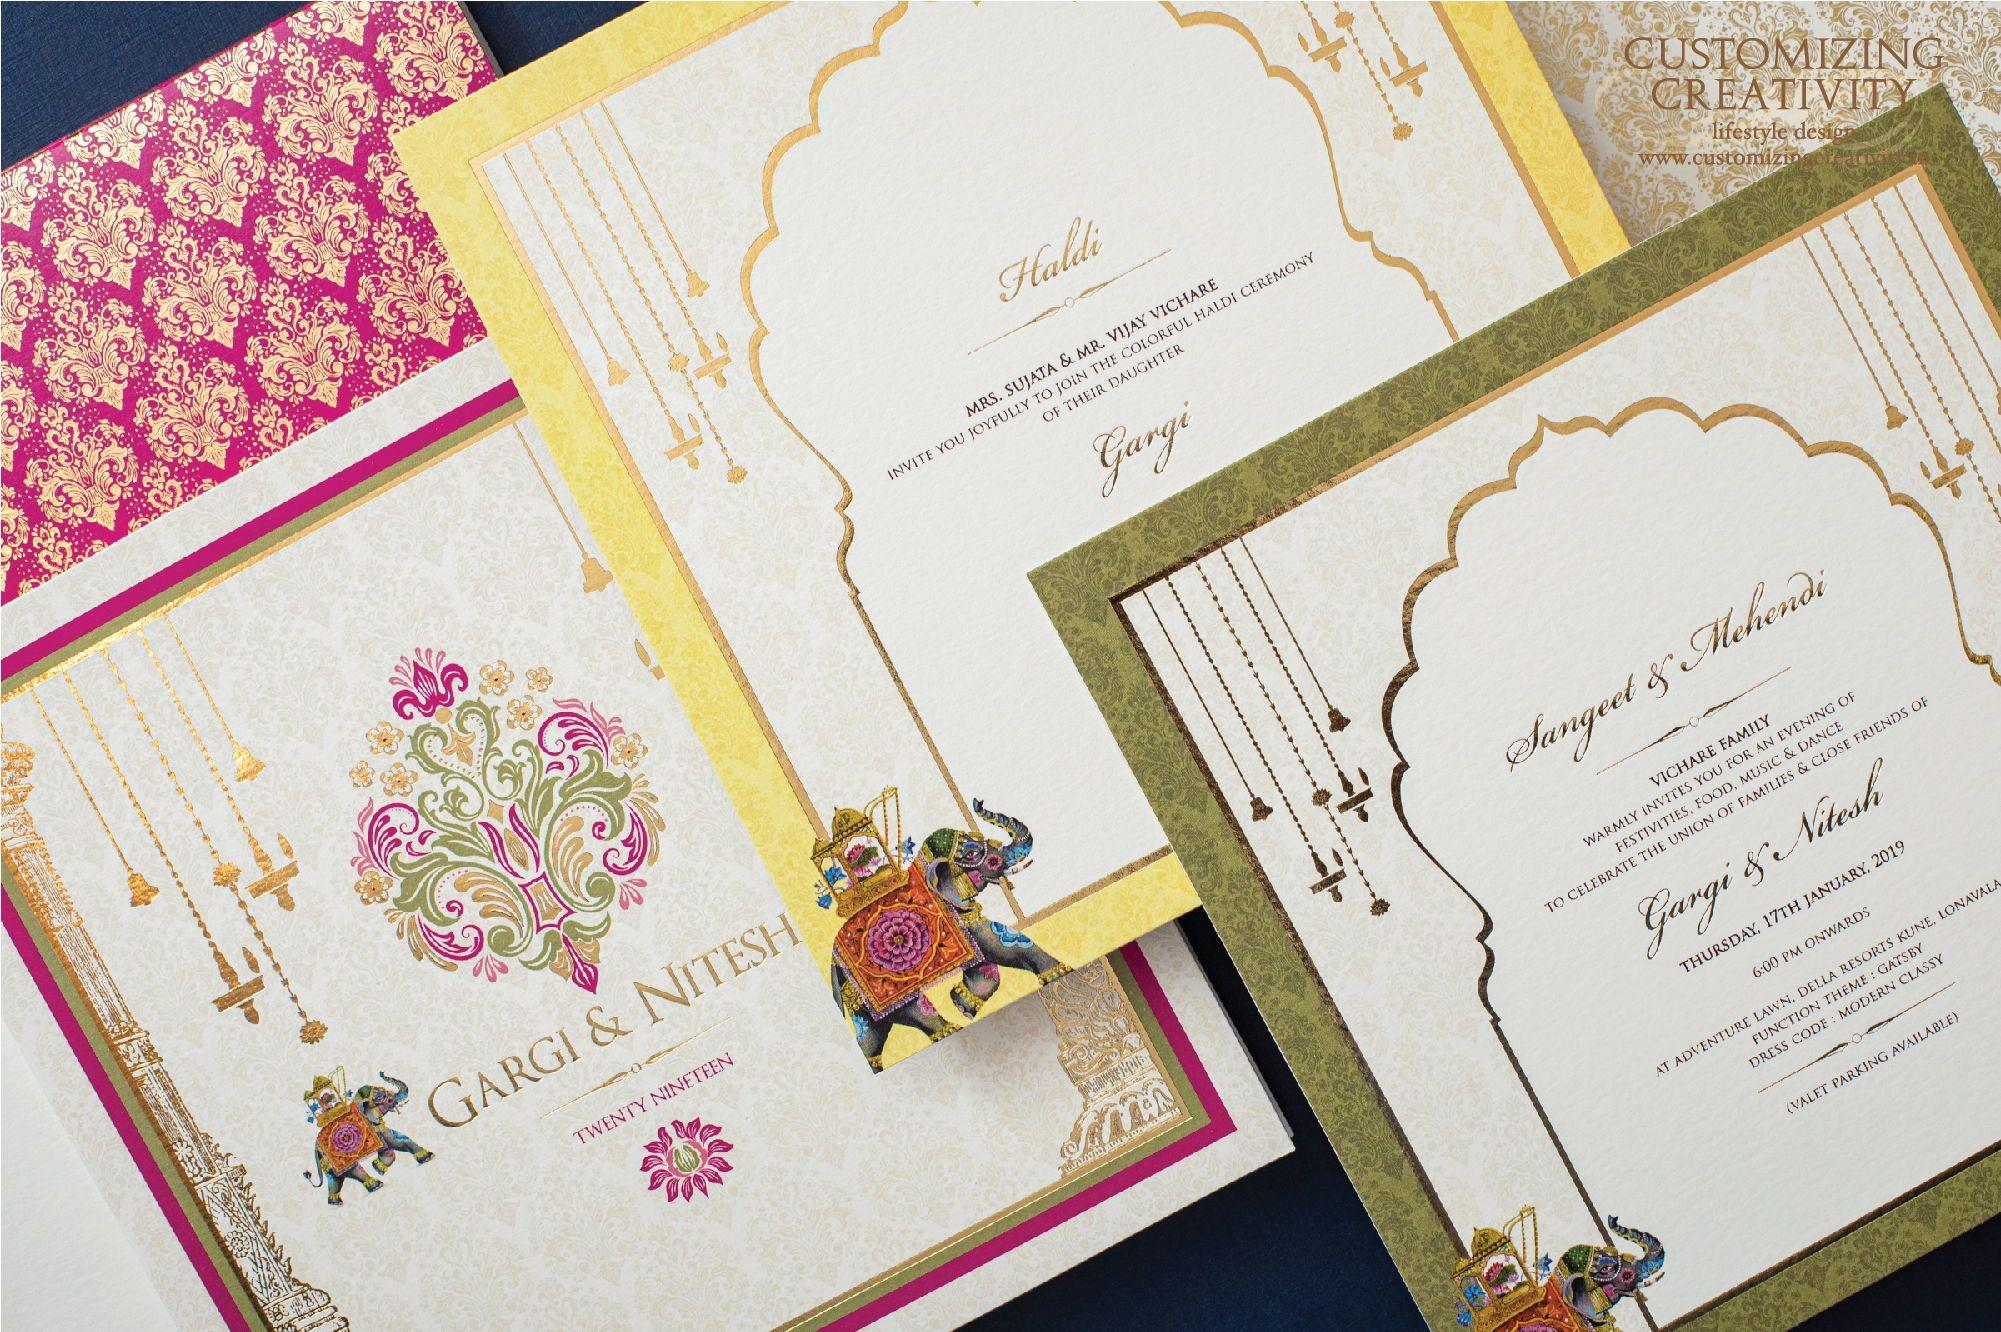 Wedding Invitation Cards Indian Wedding Cards Invites Wedding Stationery E Invite E Invitation In 2020 Wedding Cards Wedding Invitation Cards Simple Wedding Cards